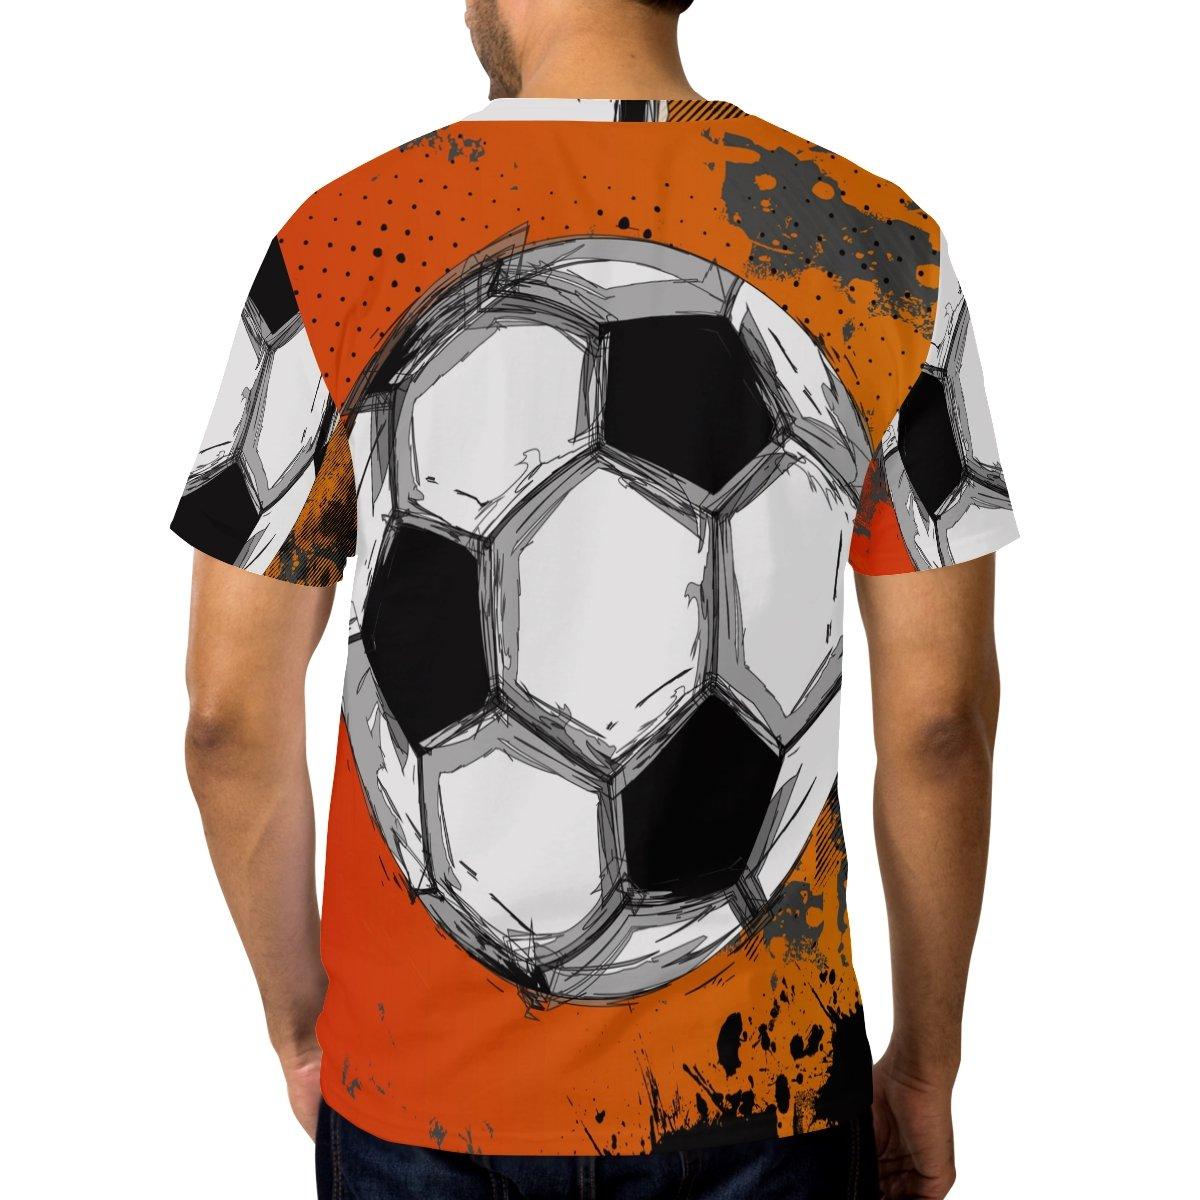 LORVIES Men/'s Grunge Color Full Soccer Ball Short Sleeve T Shirts